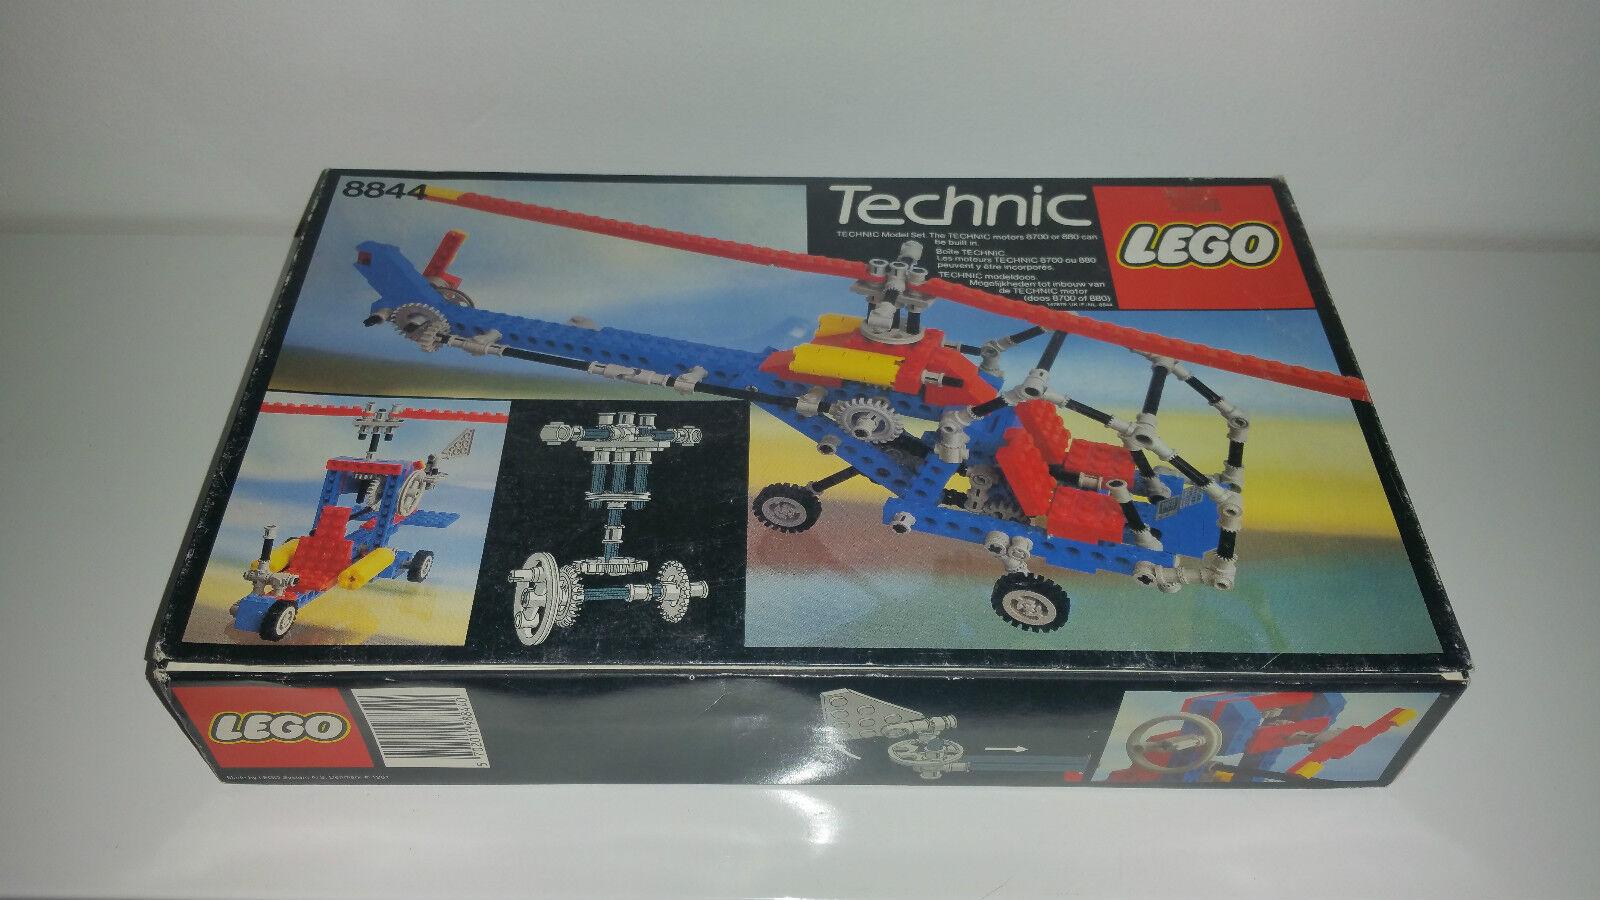 LEGO TECHNICS 8844 HELICOPTER NEW SEALED 1981 VINTAGE